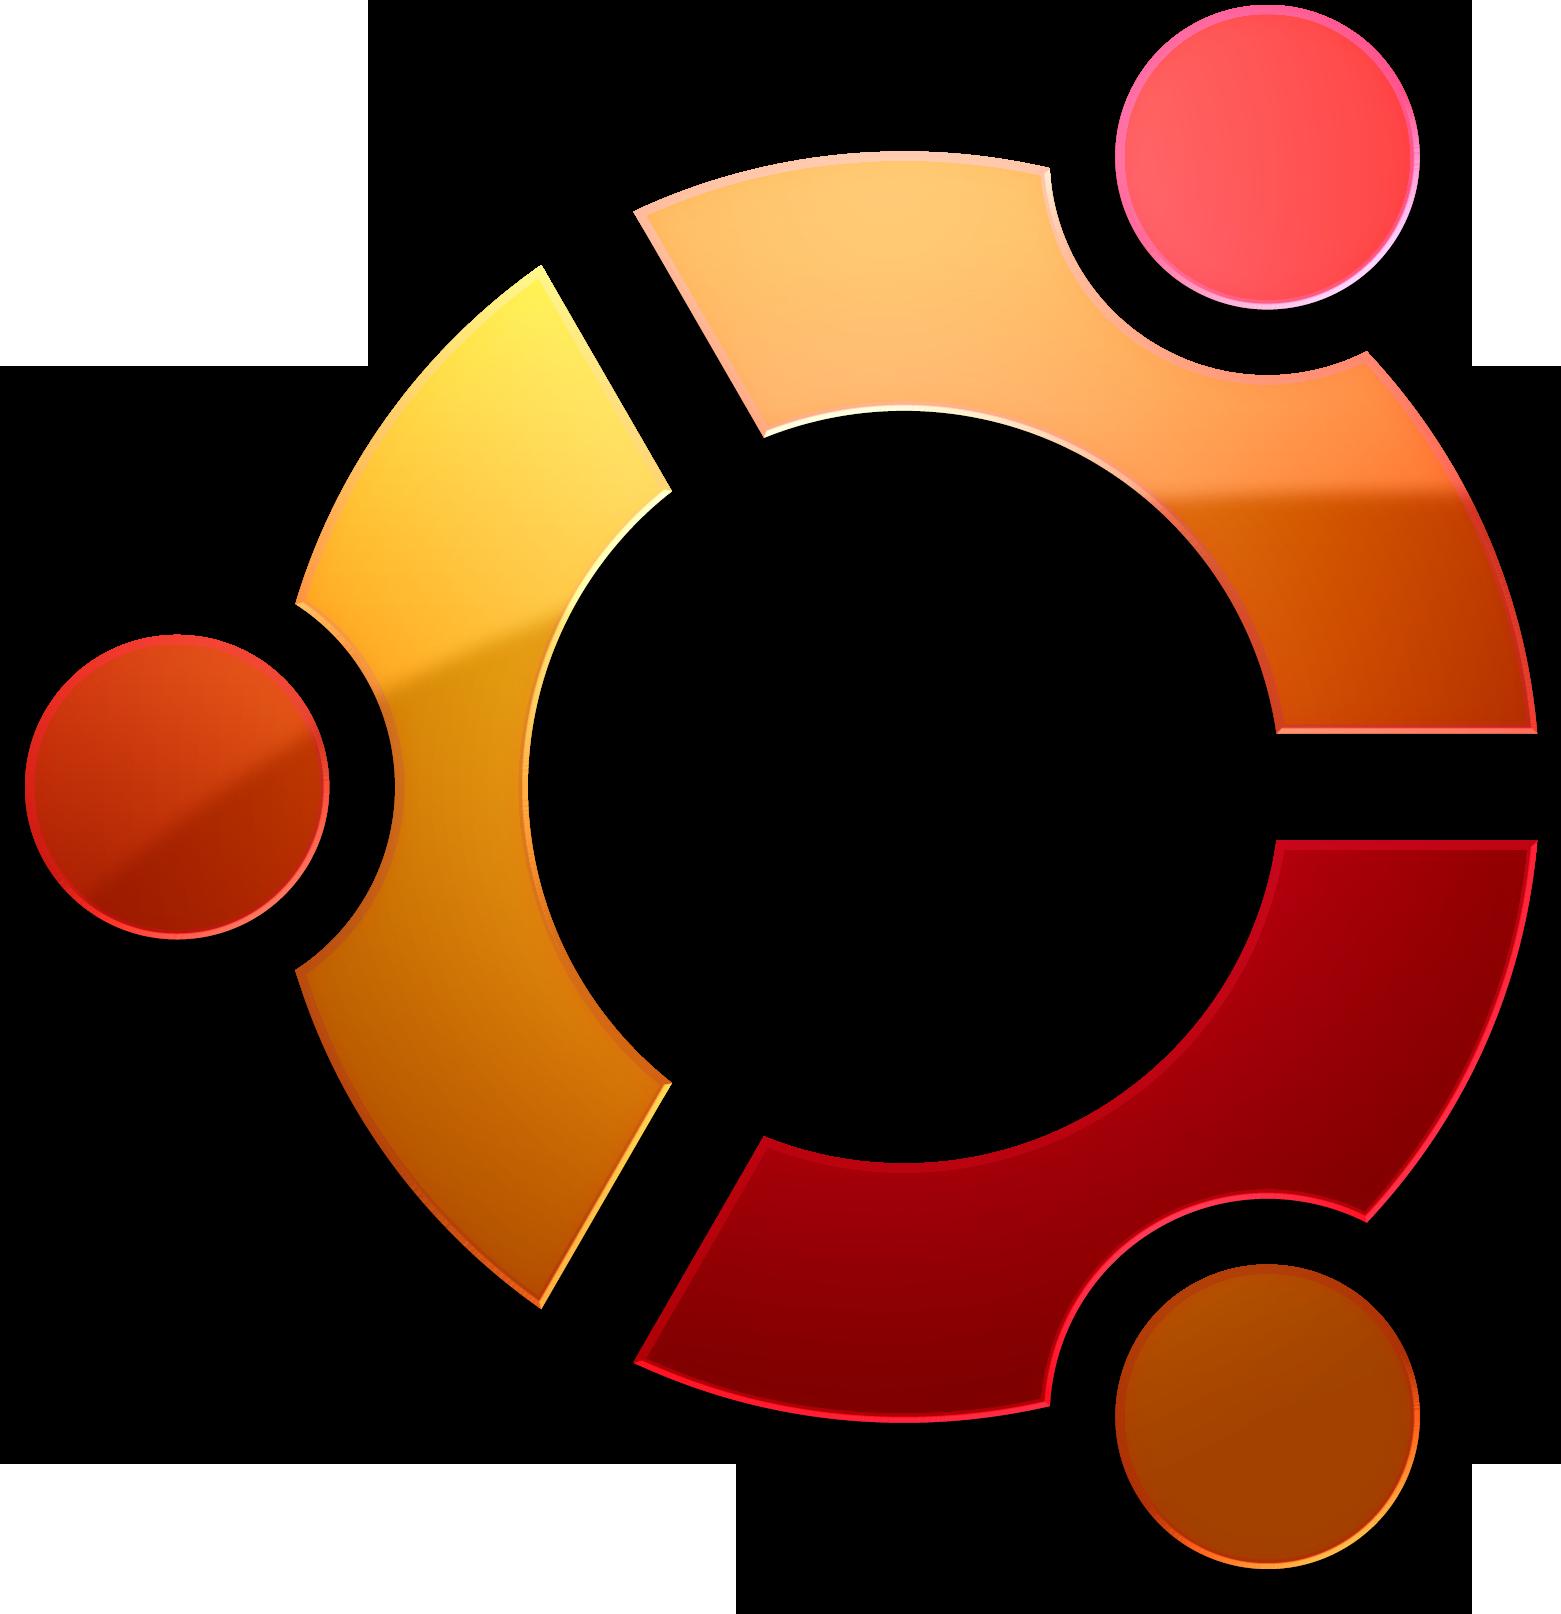 Tkip key generator